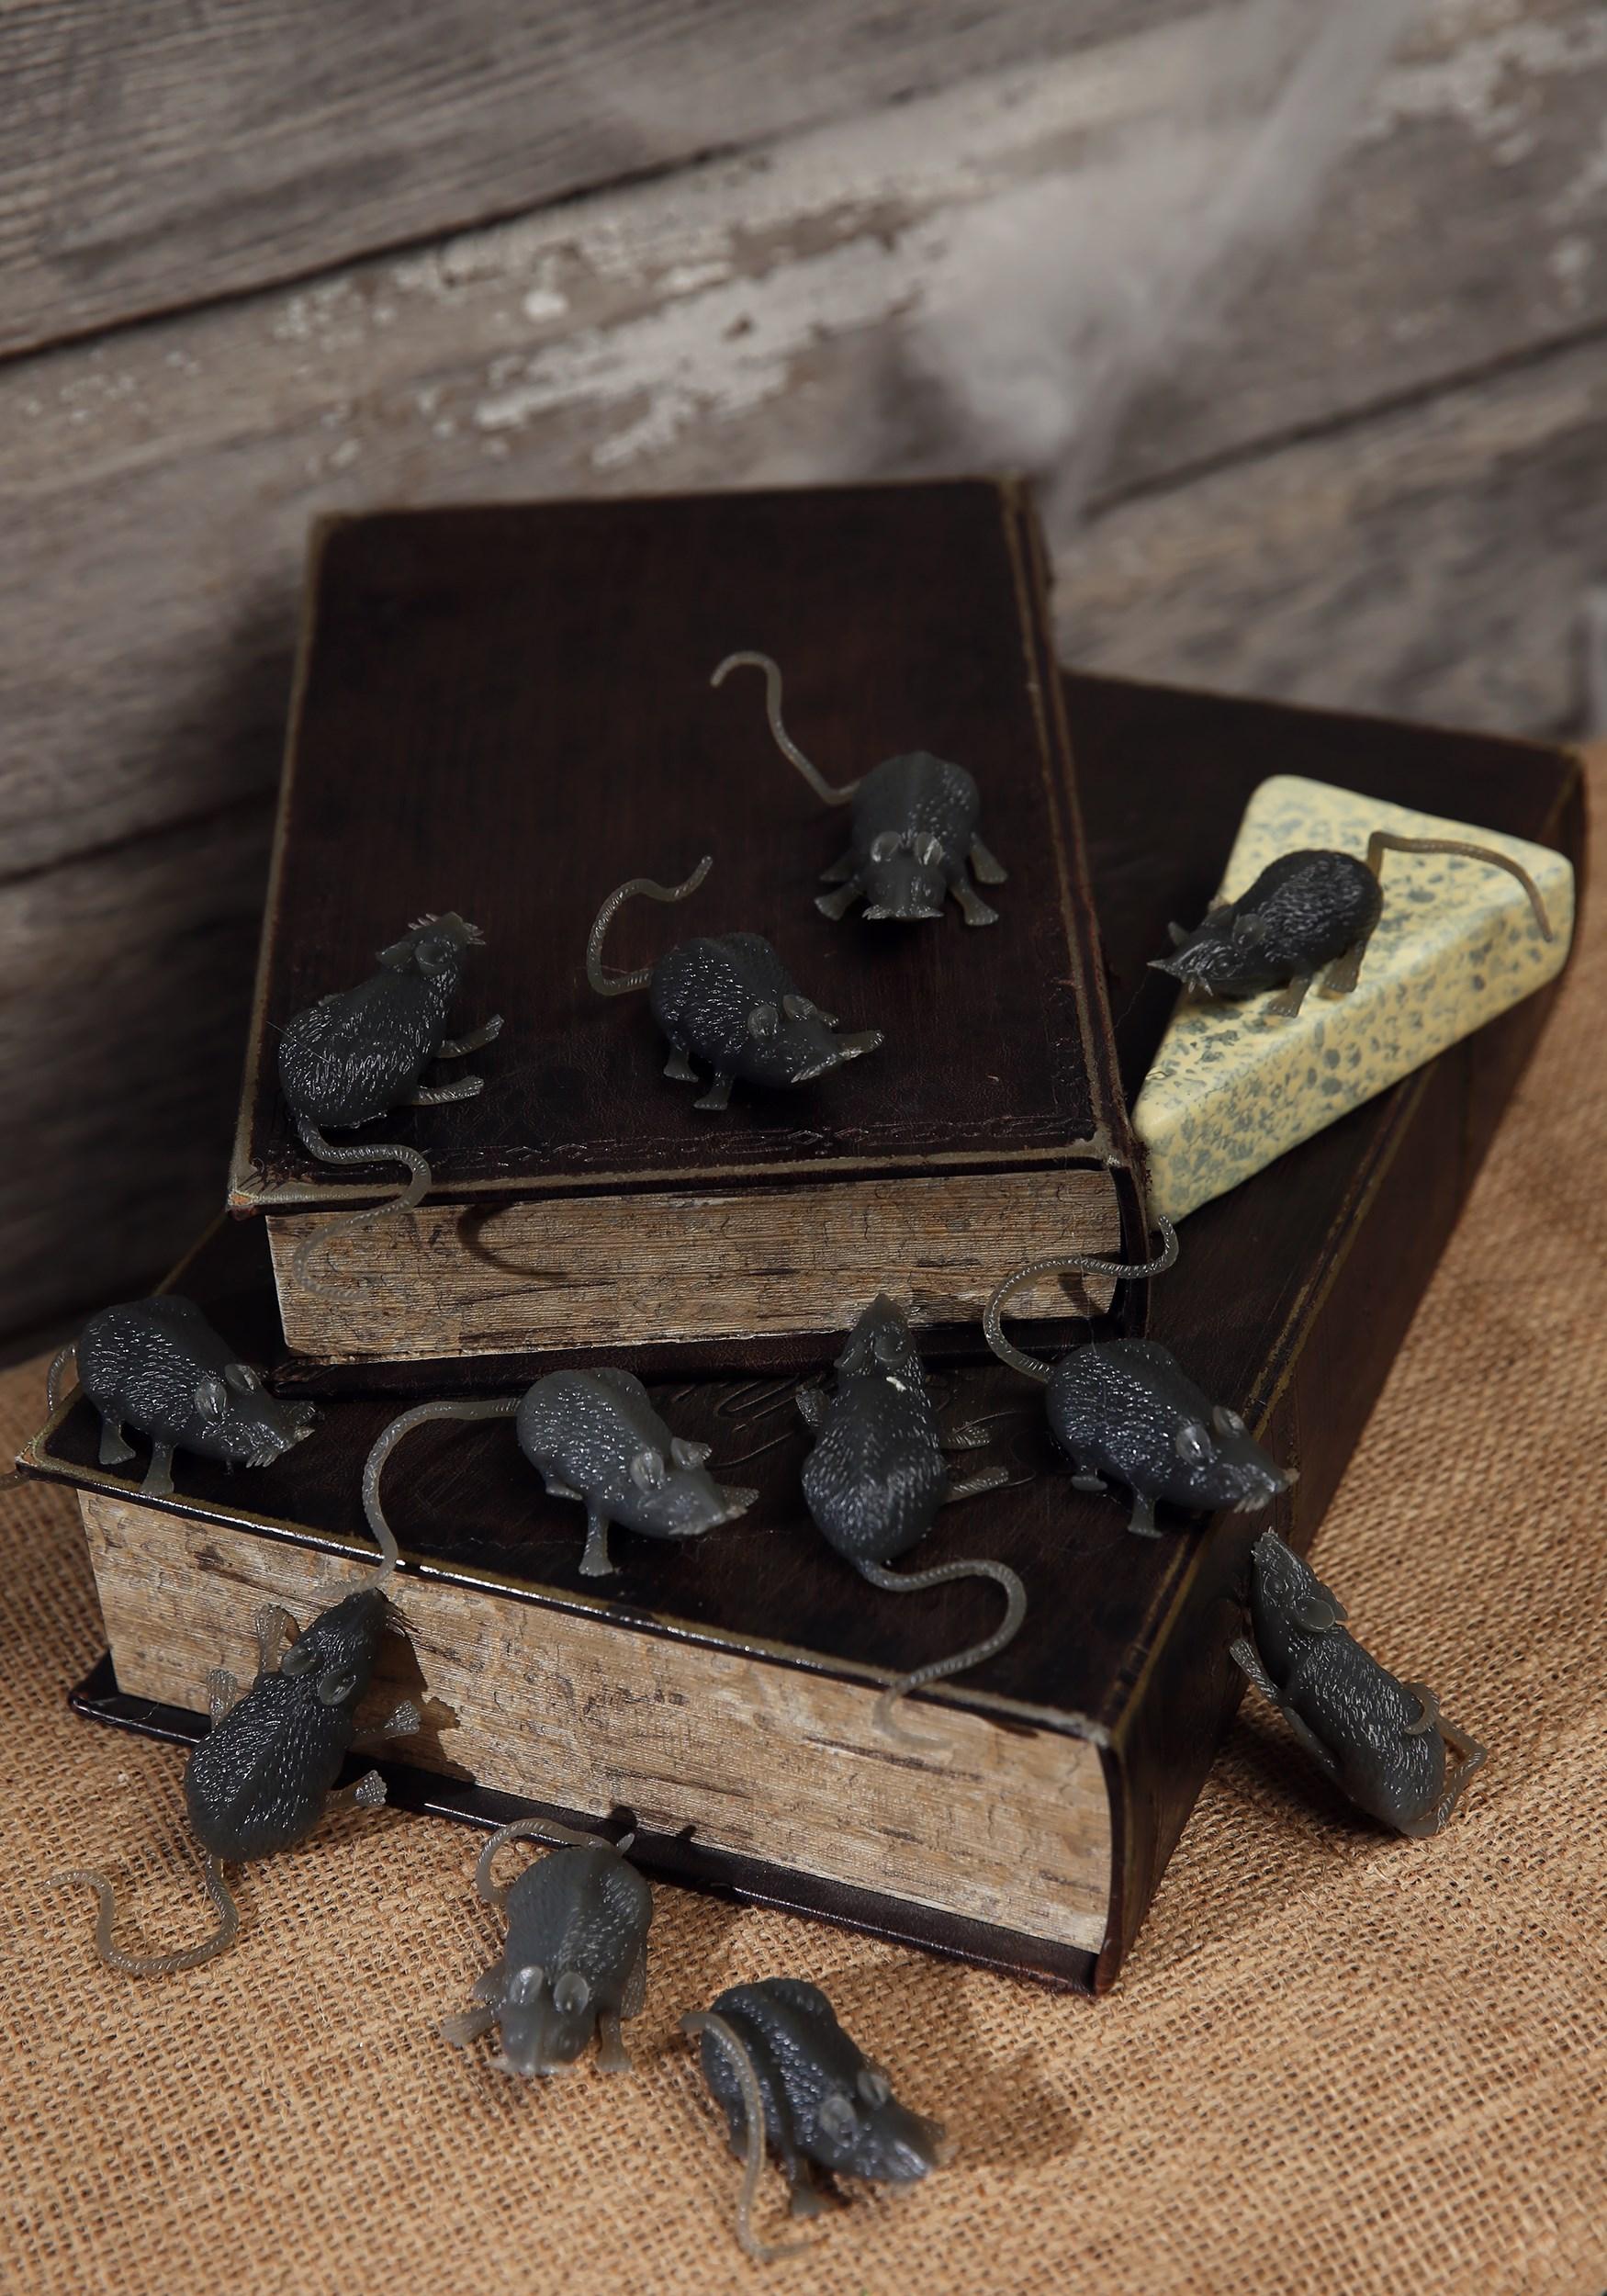 Halloween Bag of Mice Decoration